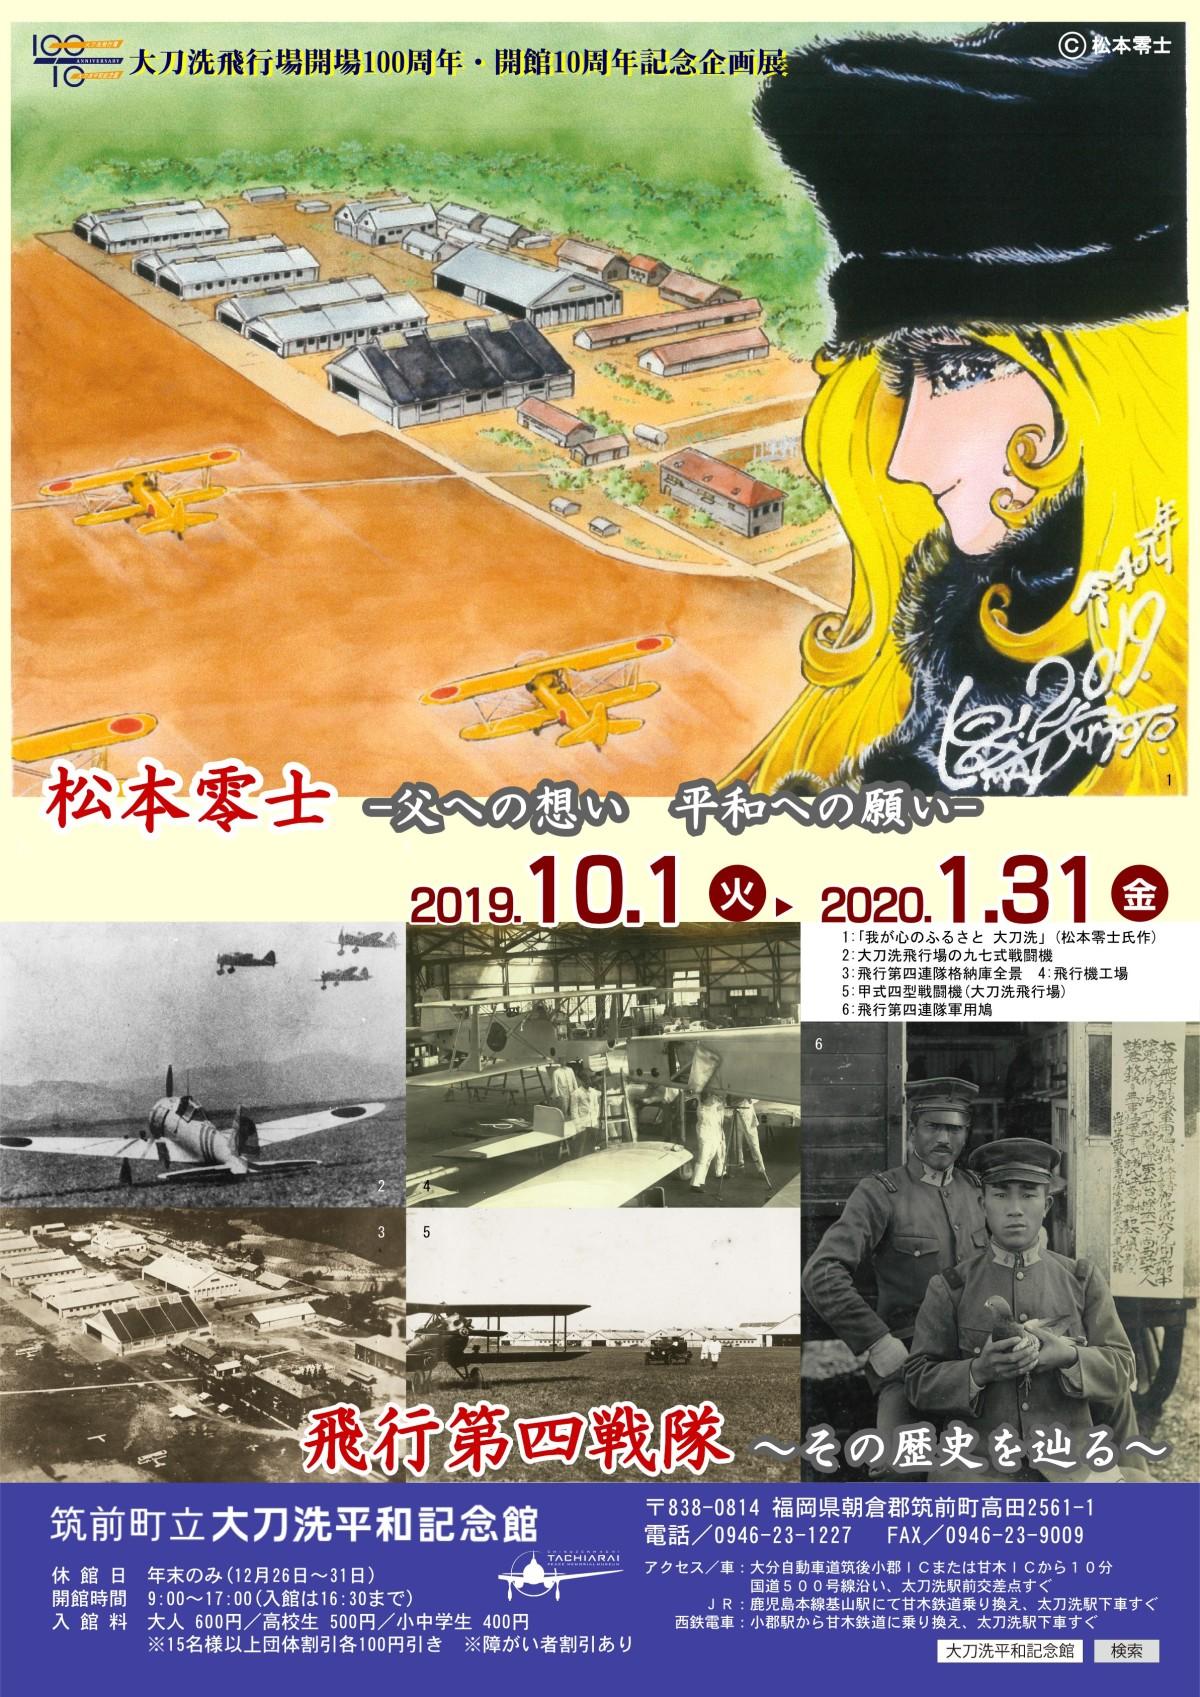 大刀洗平和記念館、開館10周年で企画展 松本零士さん作品も展示 ...